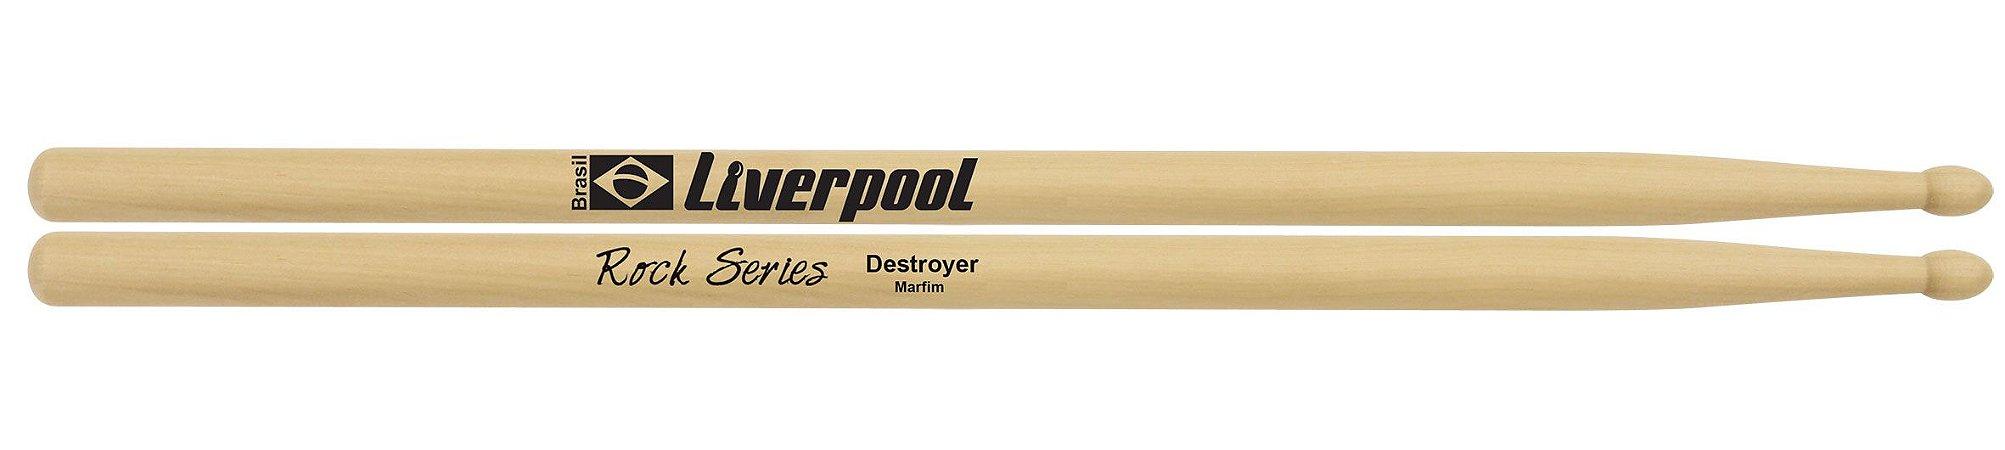 Liverpool Baqueta Rock Destroyer RODES